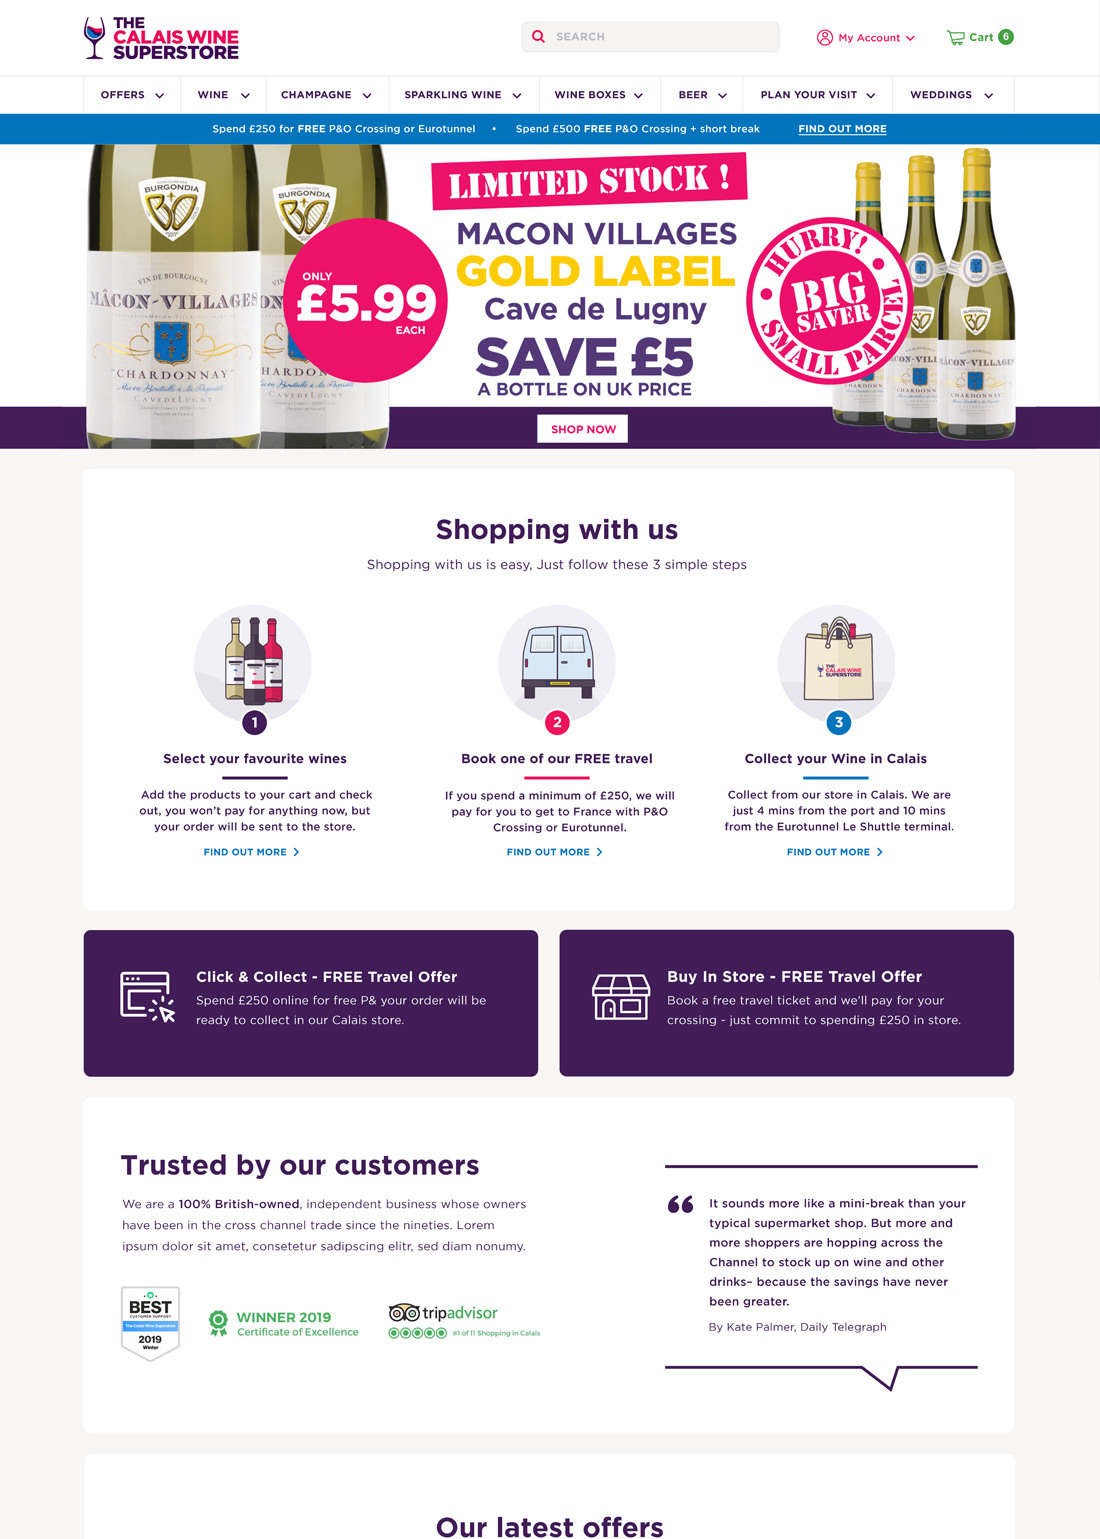 Calais wine top